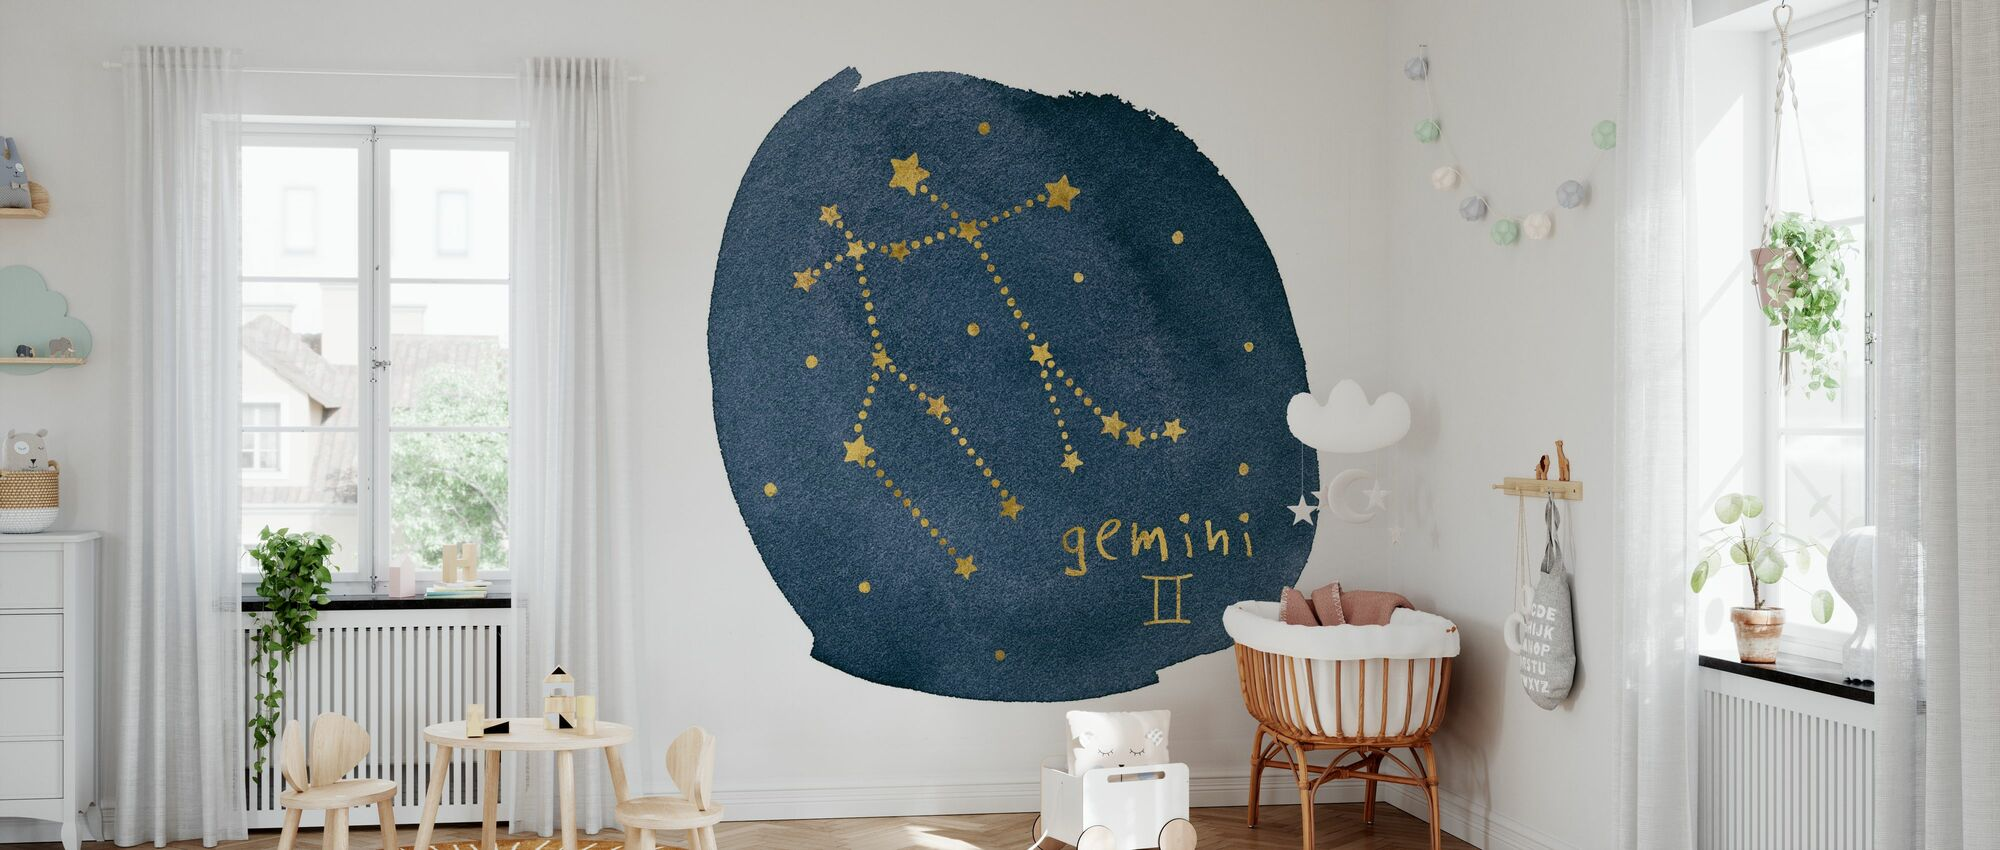 Horoscope Gemini - Wallpaper - Nursery